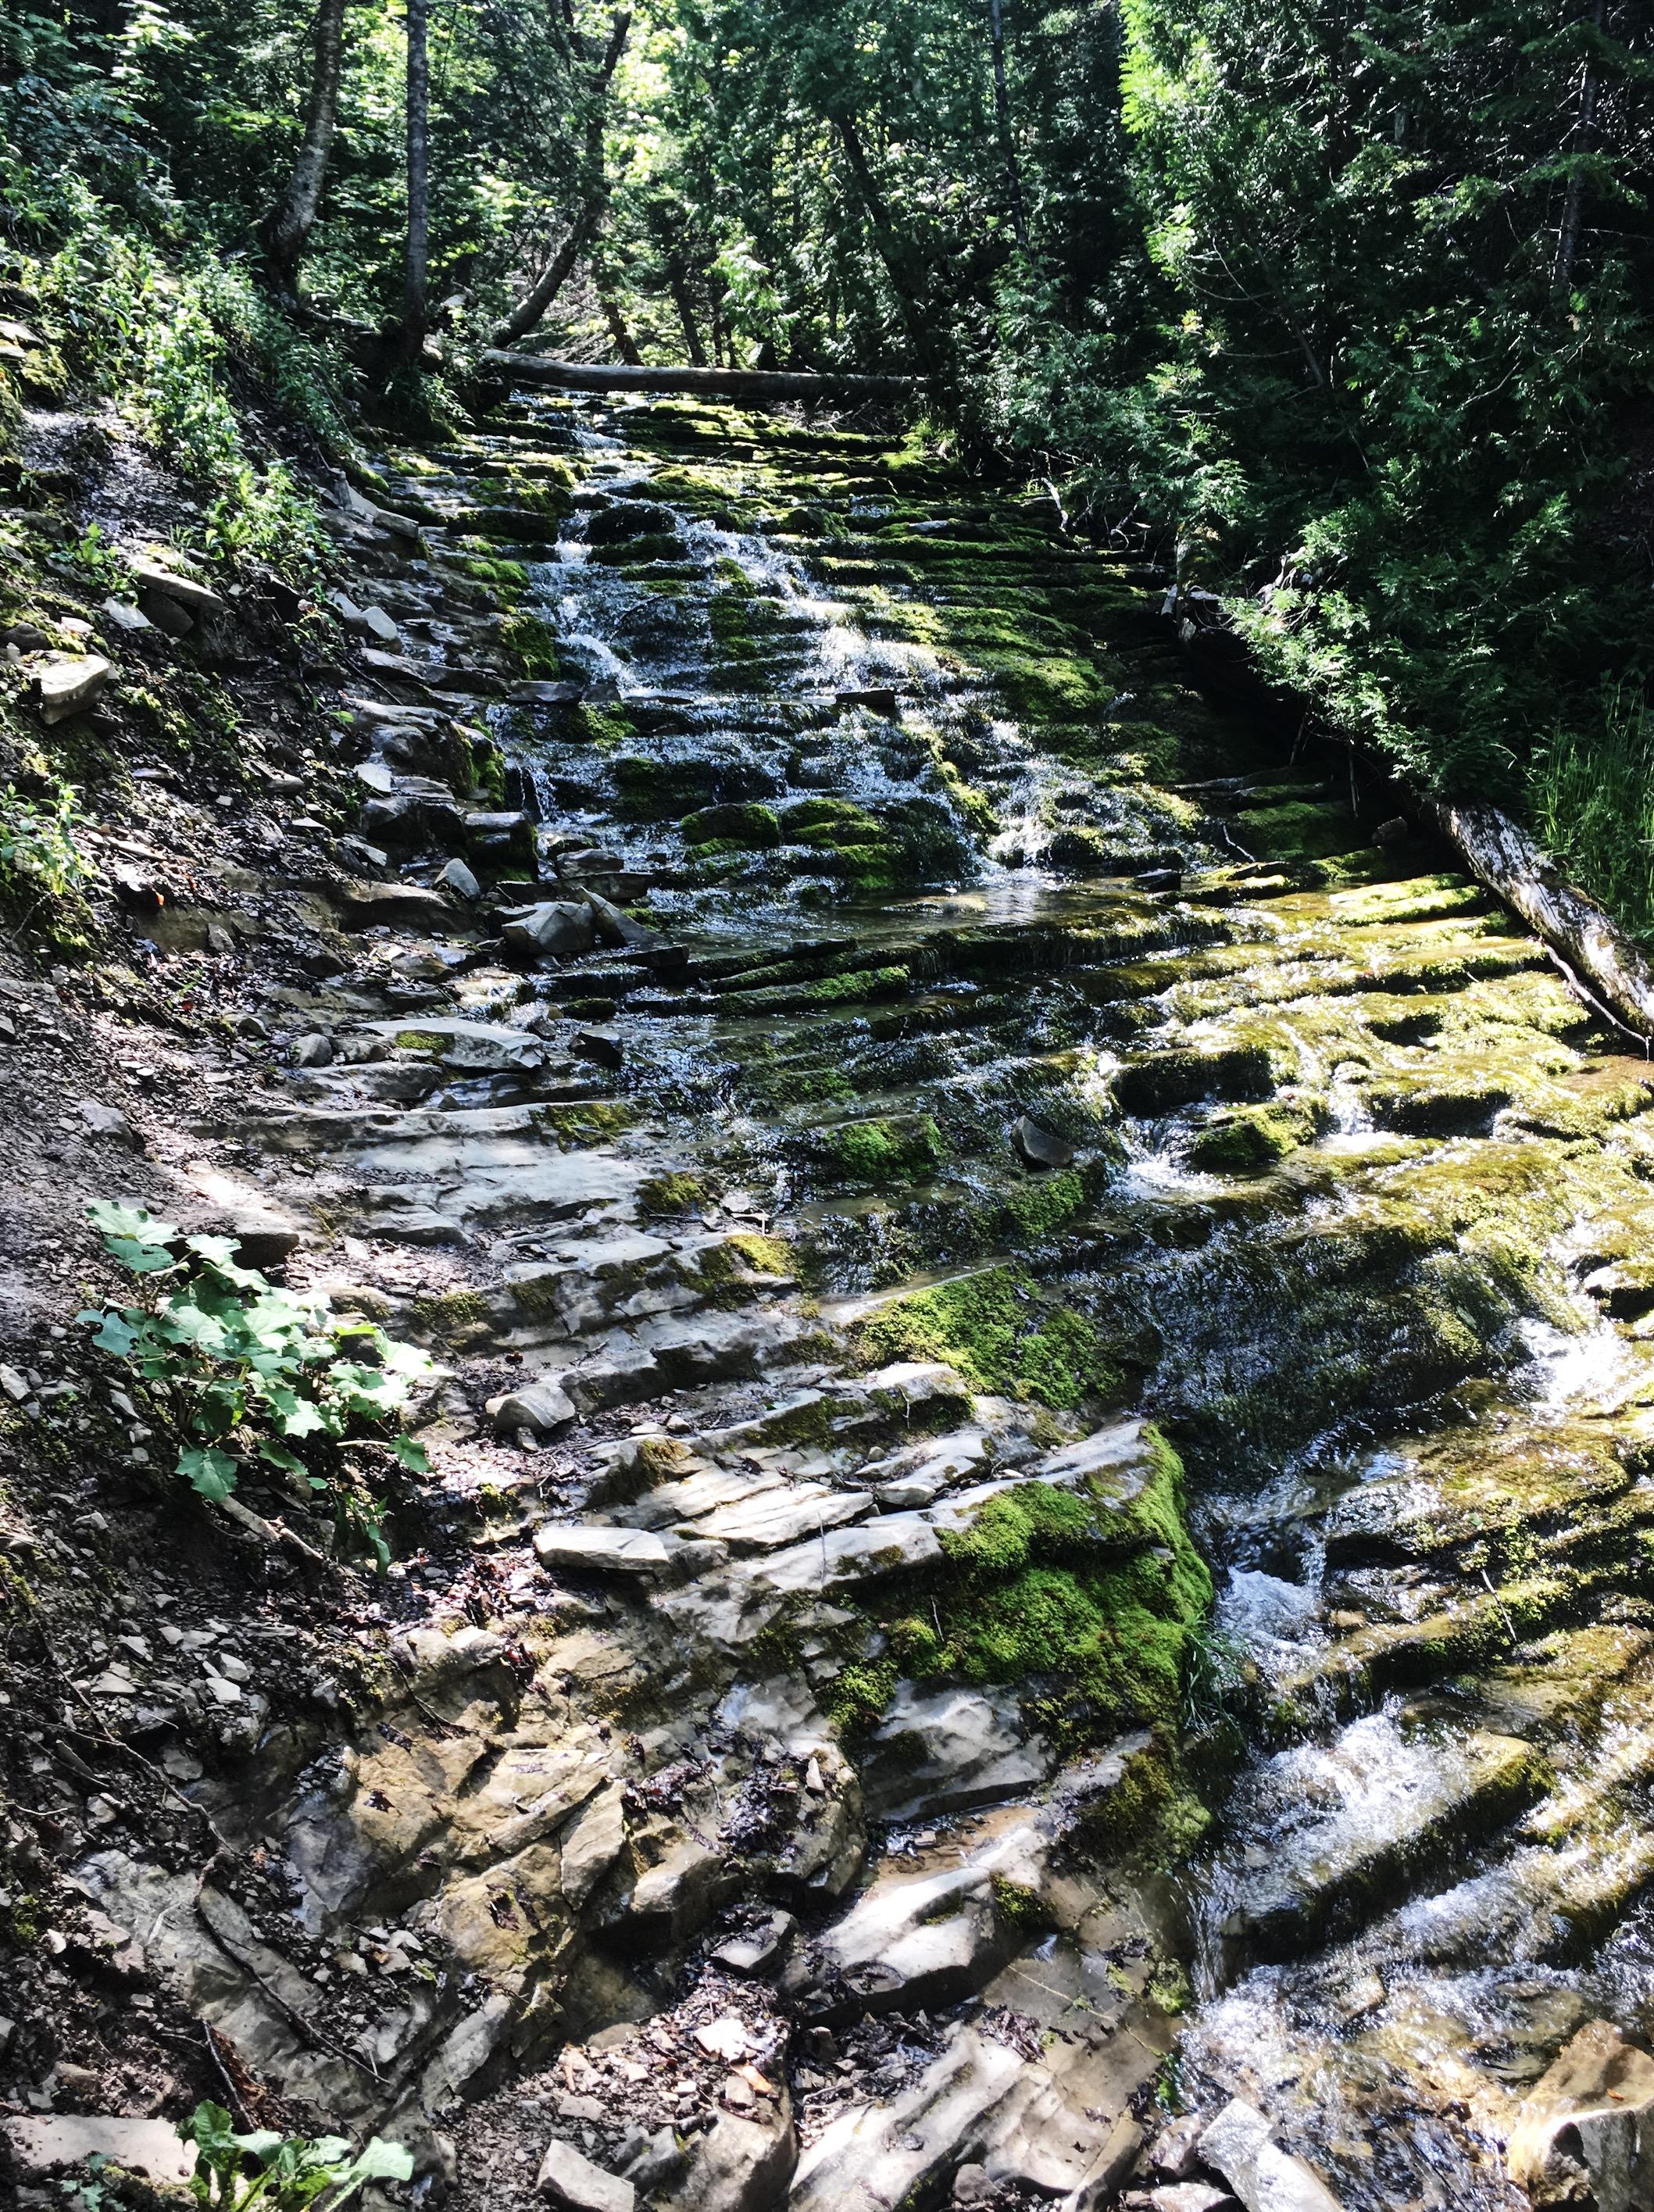 sentier-de-la-chute-gaspésie-québec